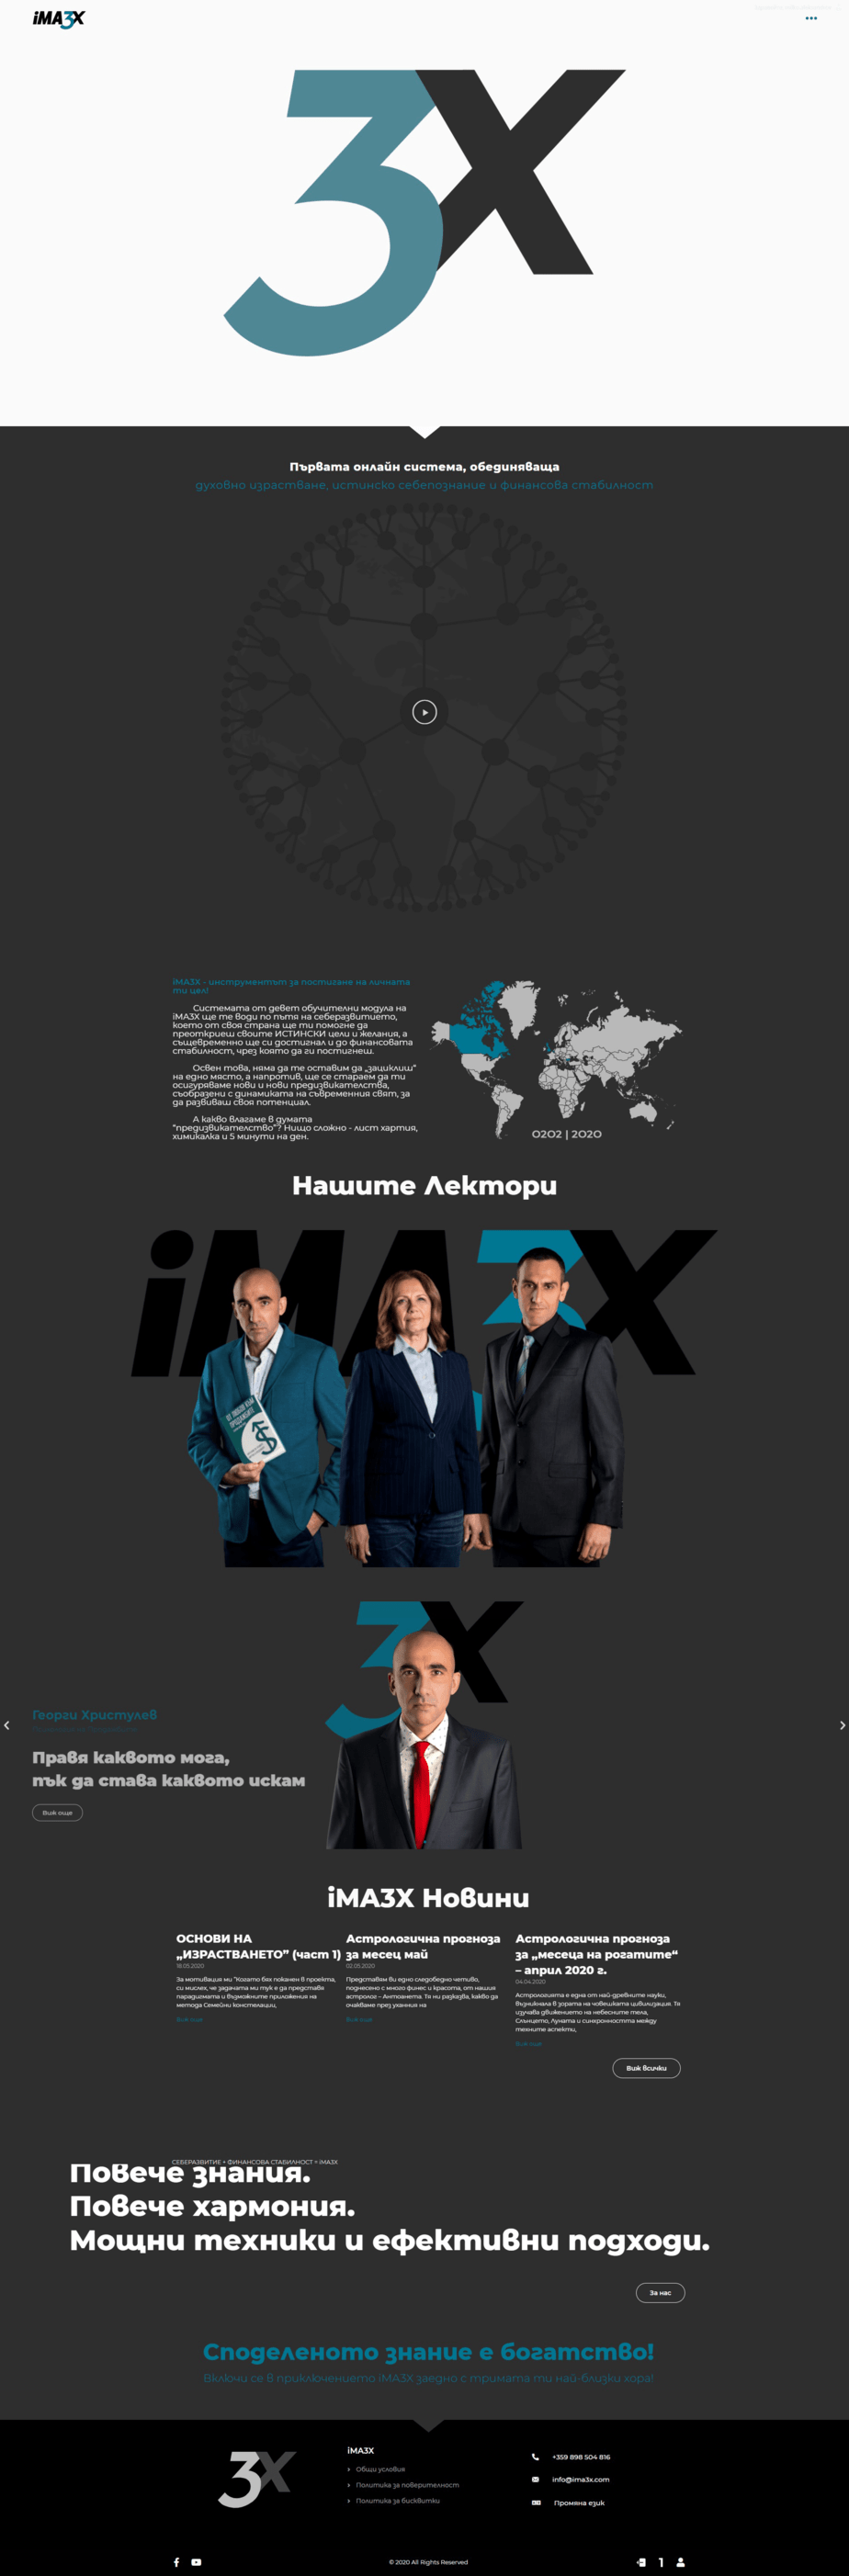 ima3x home page